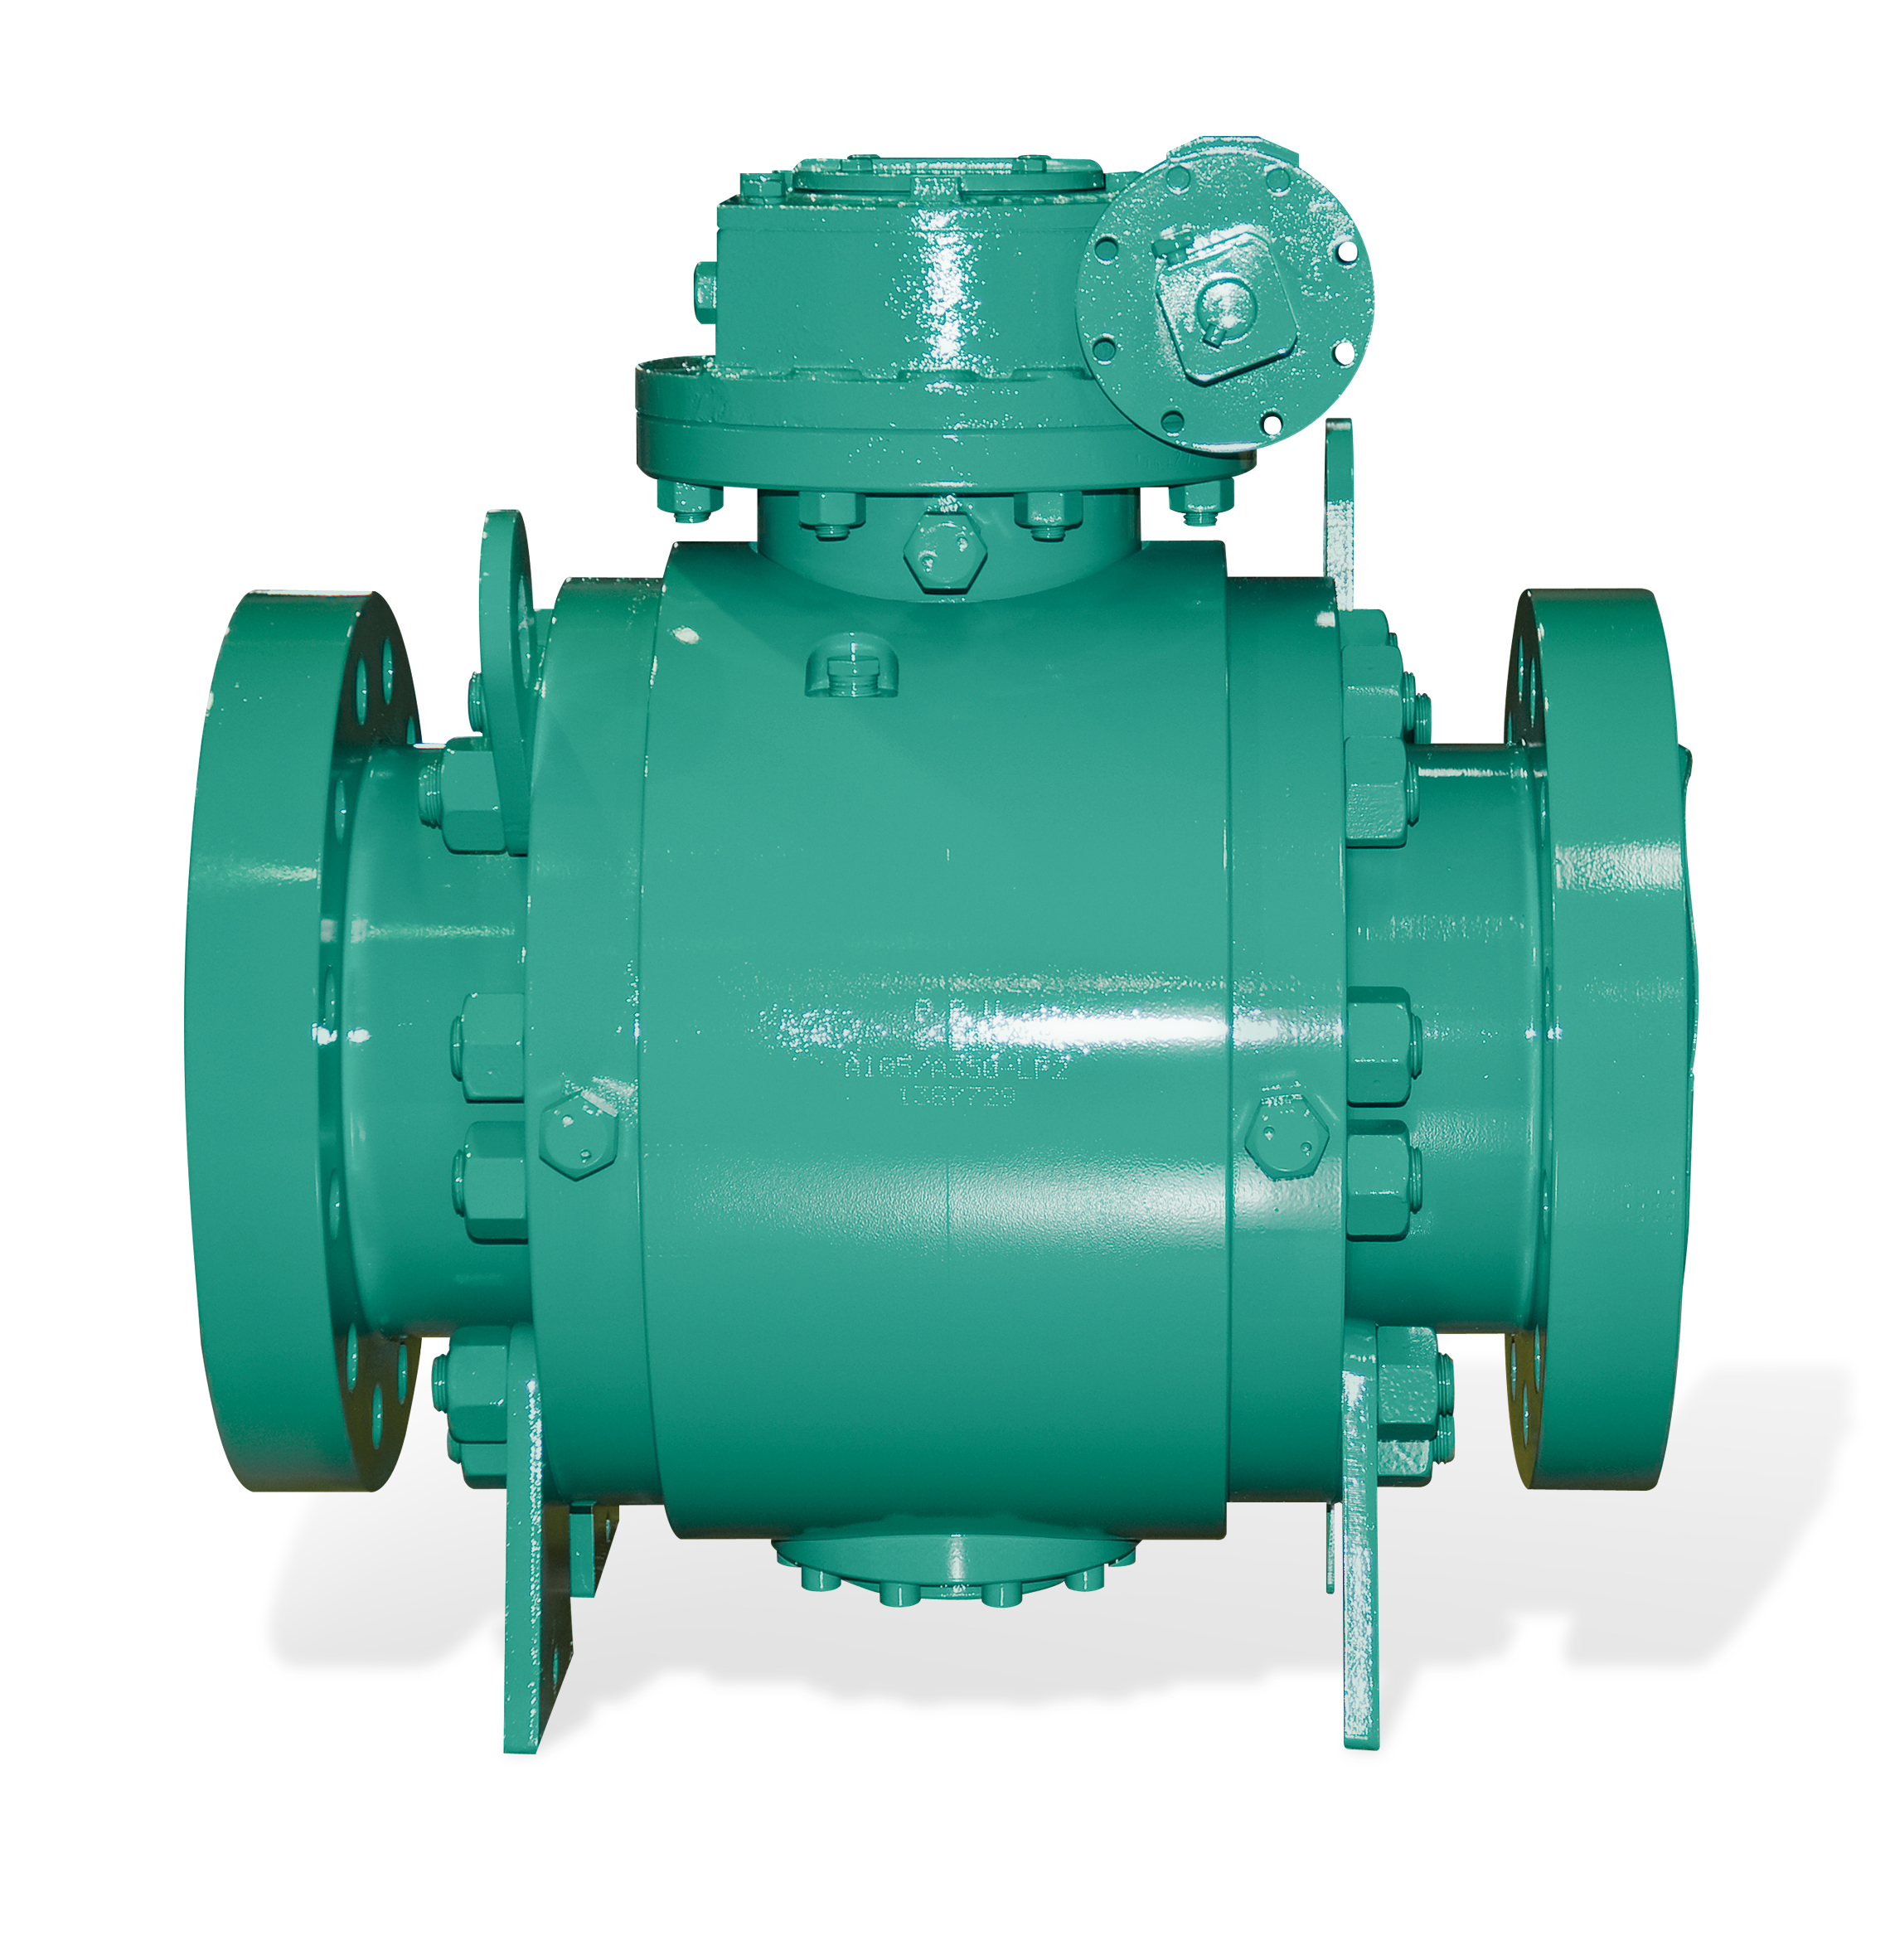 Flinder valves and controls inc case study